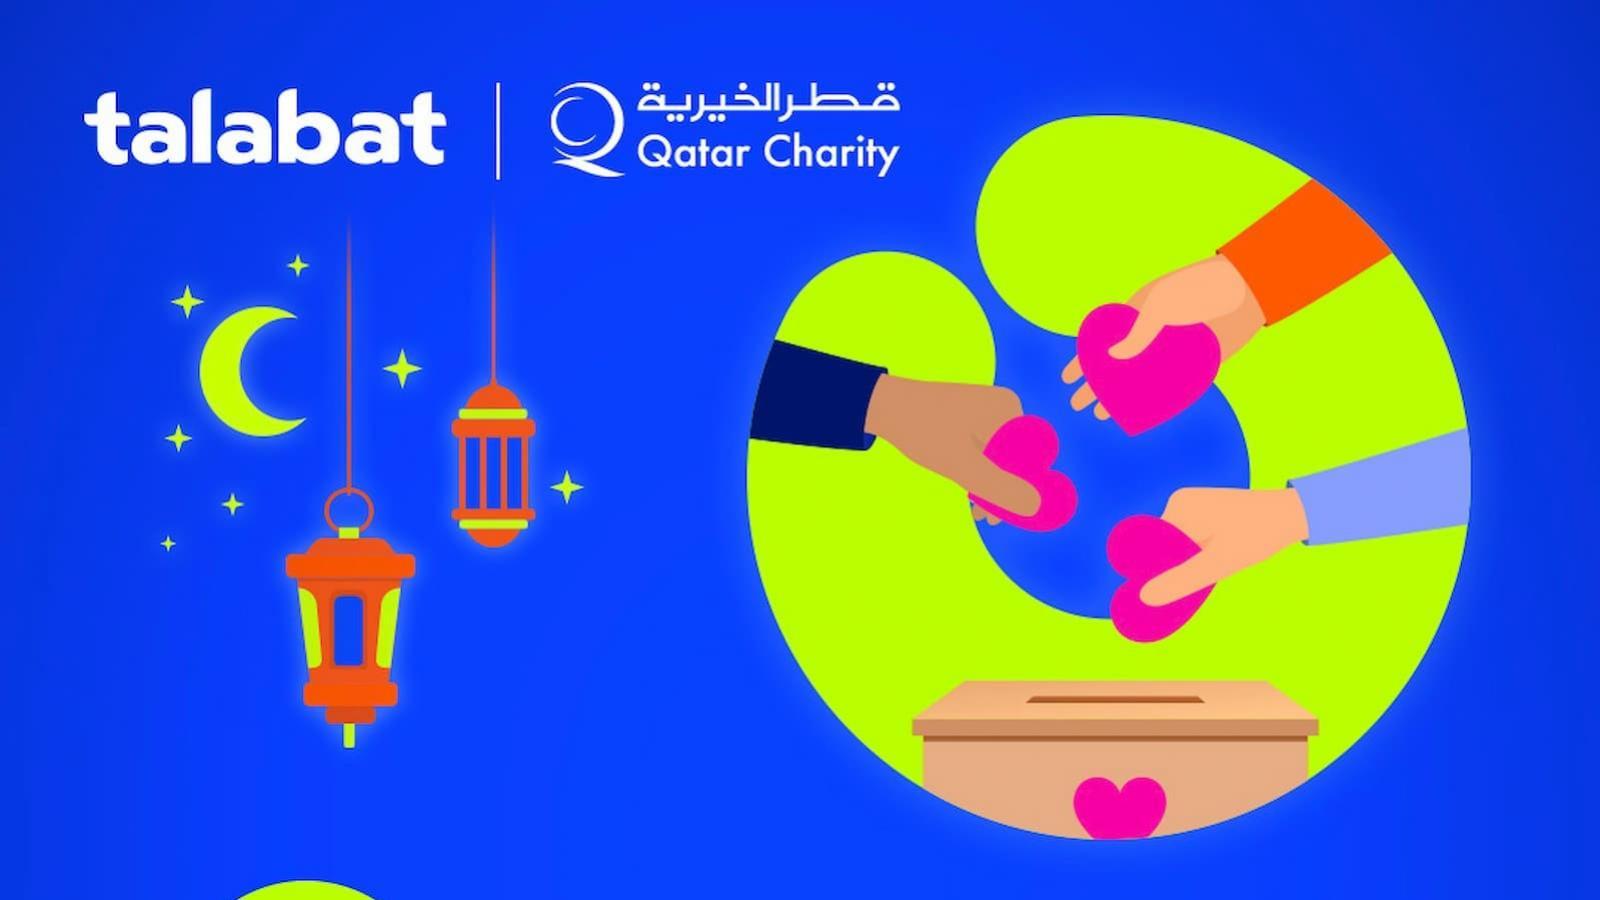 Talabat Qatar wraps up Ramadan campaign, facilitating over 51,337 meal donations to Qatar Charity